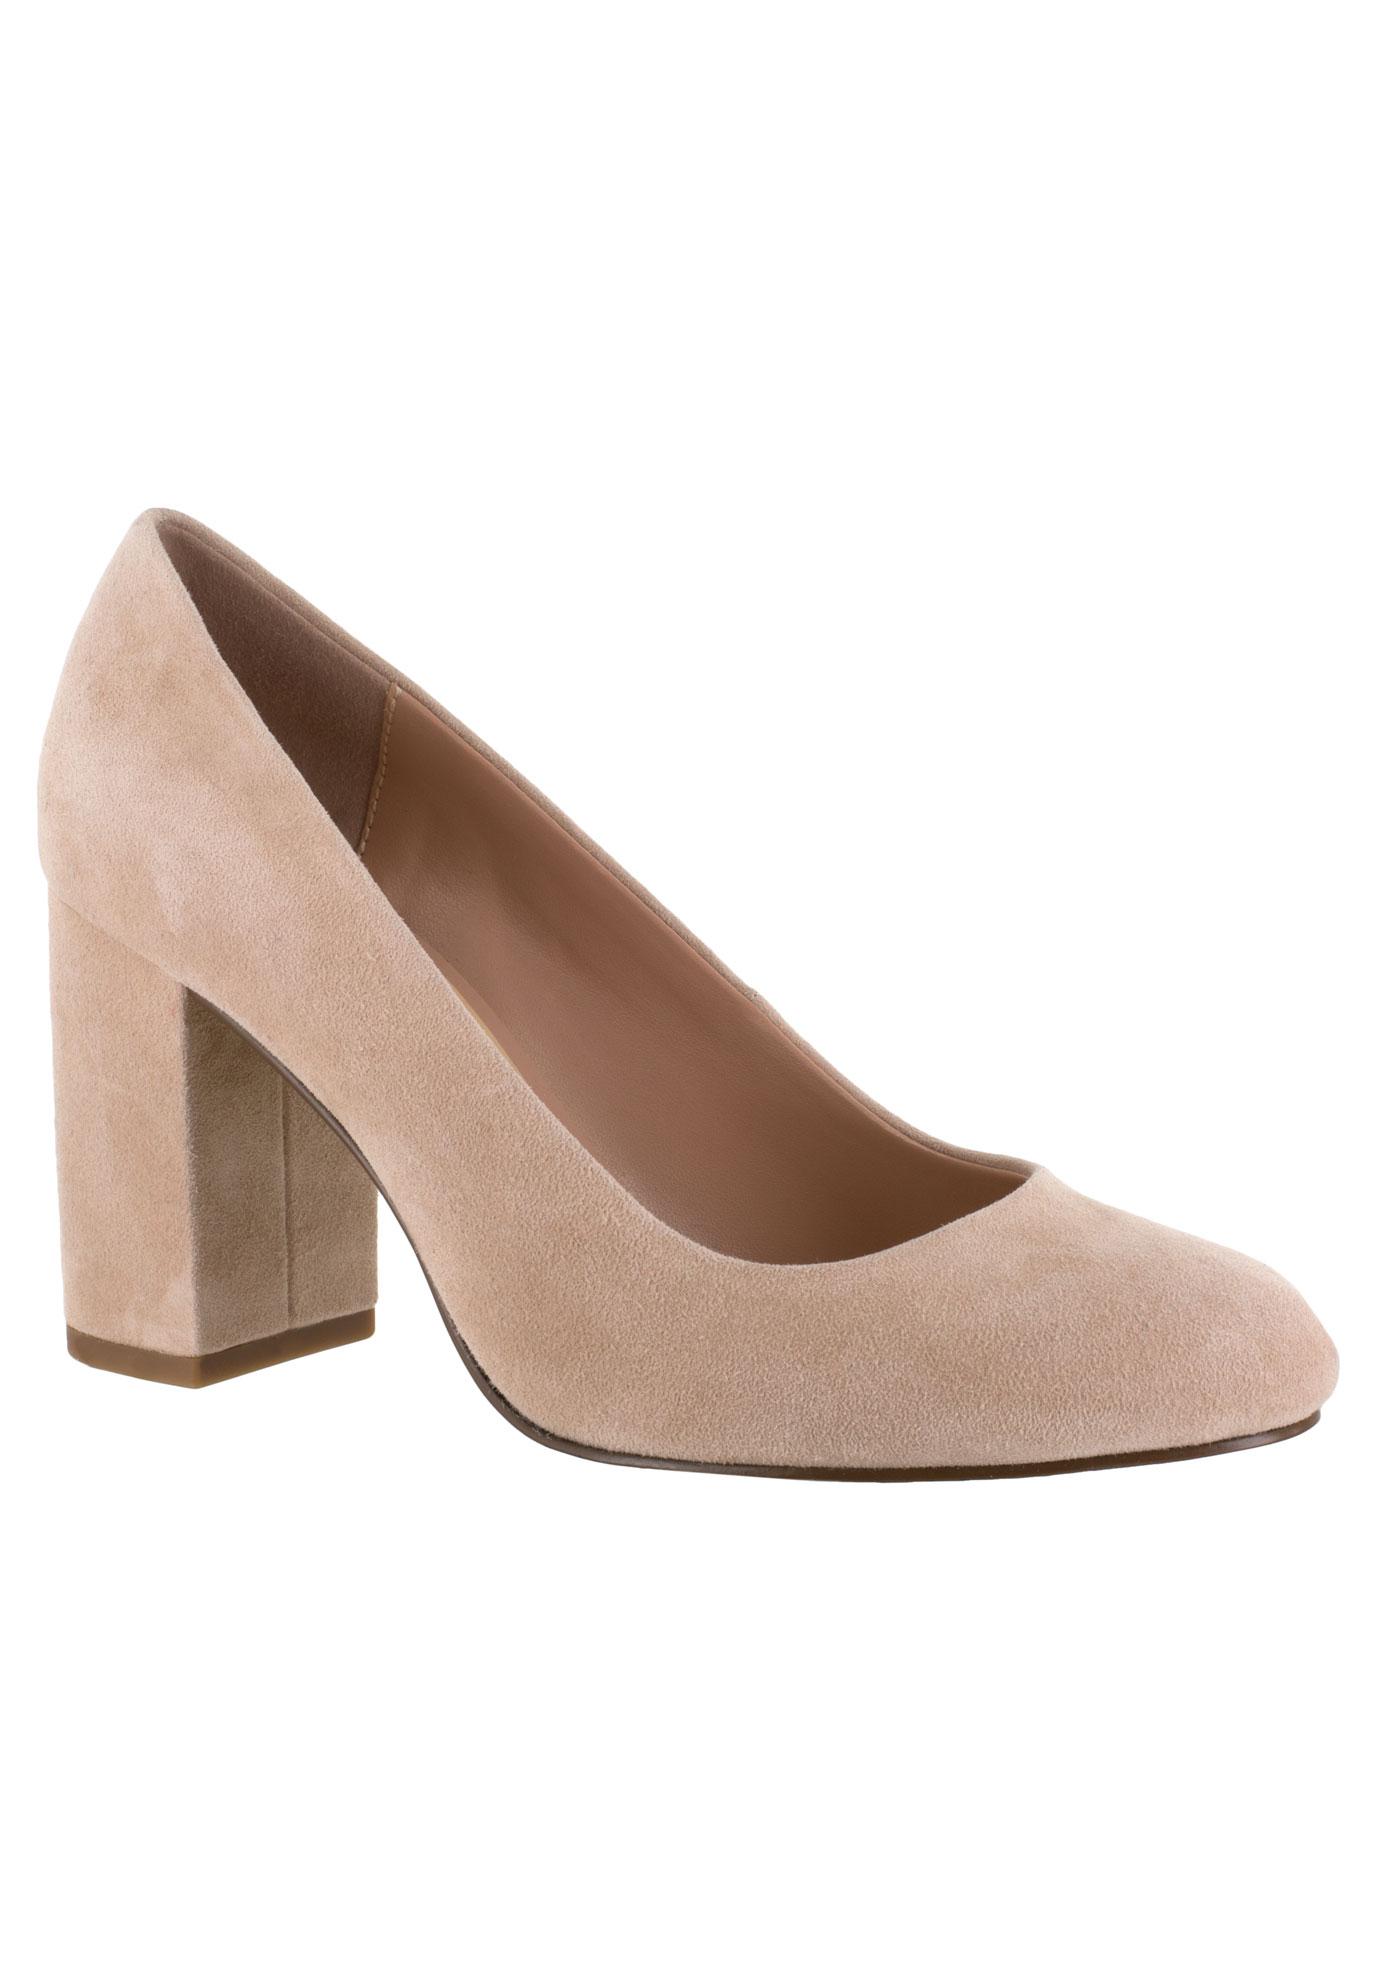 be35b635b9 Nara Leather Pump by Bella Vita® | Plus Size Dress Shoes | Jessica ...